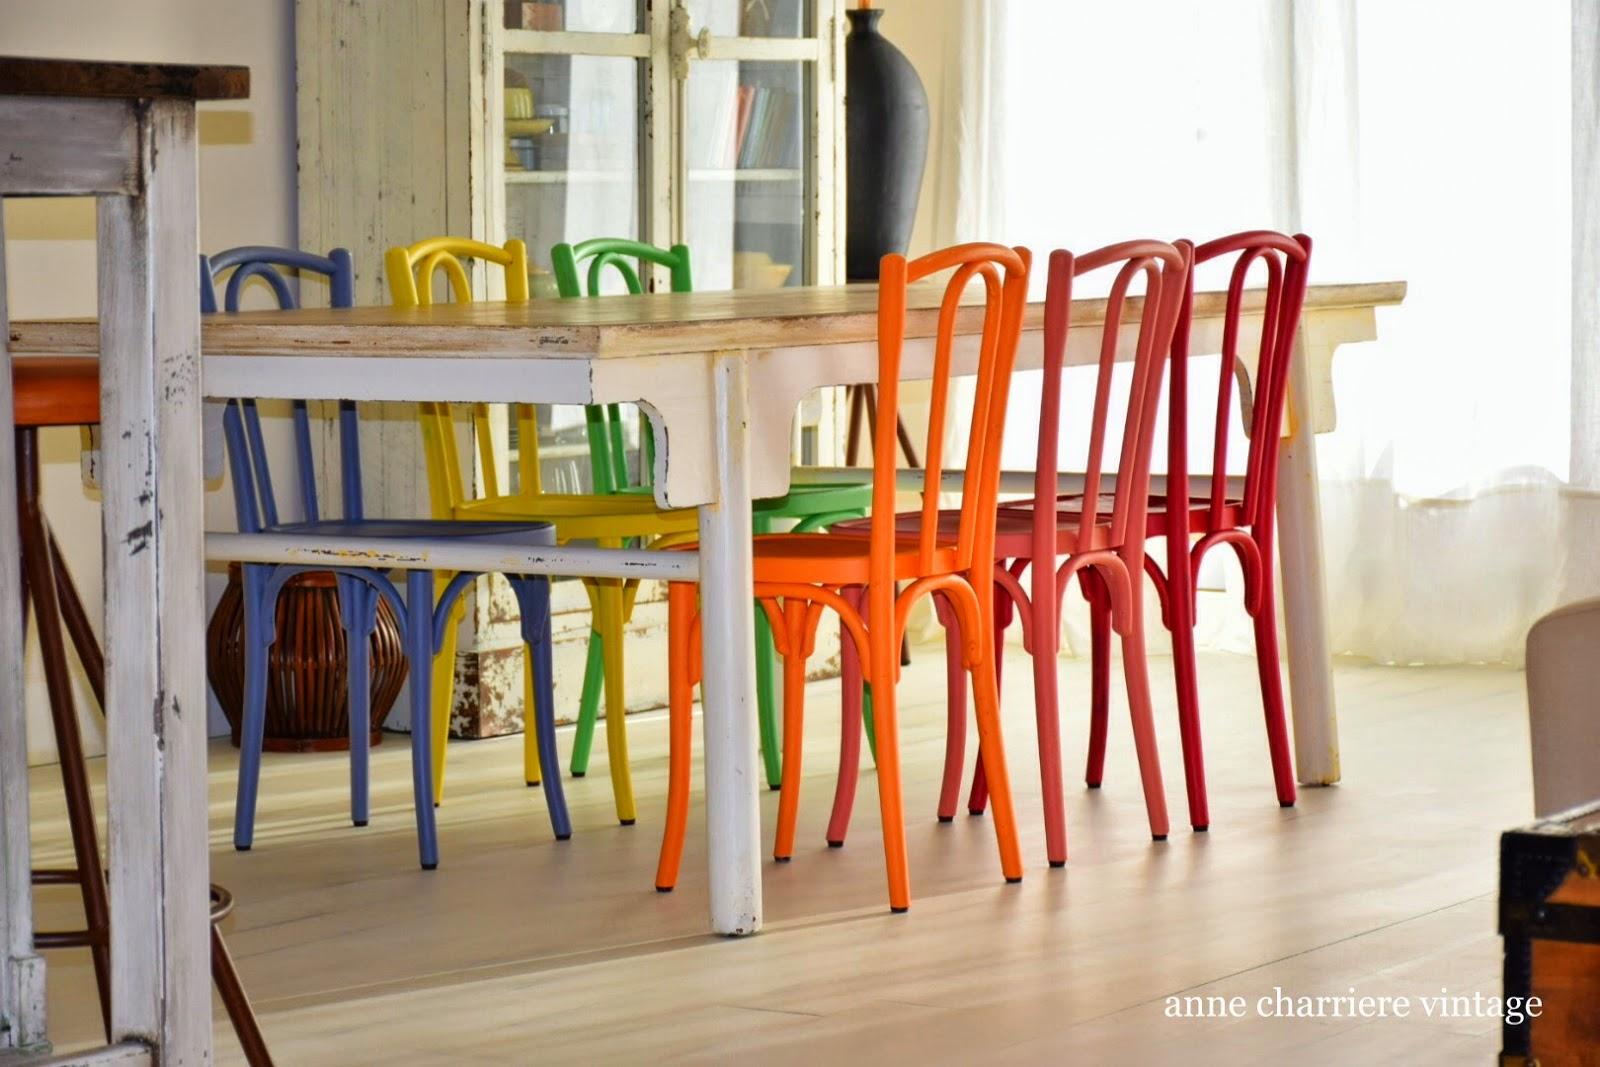 www.annecharriere.com, anne charriere vintage, pintar sillas de café,